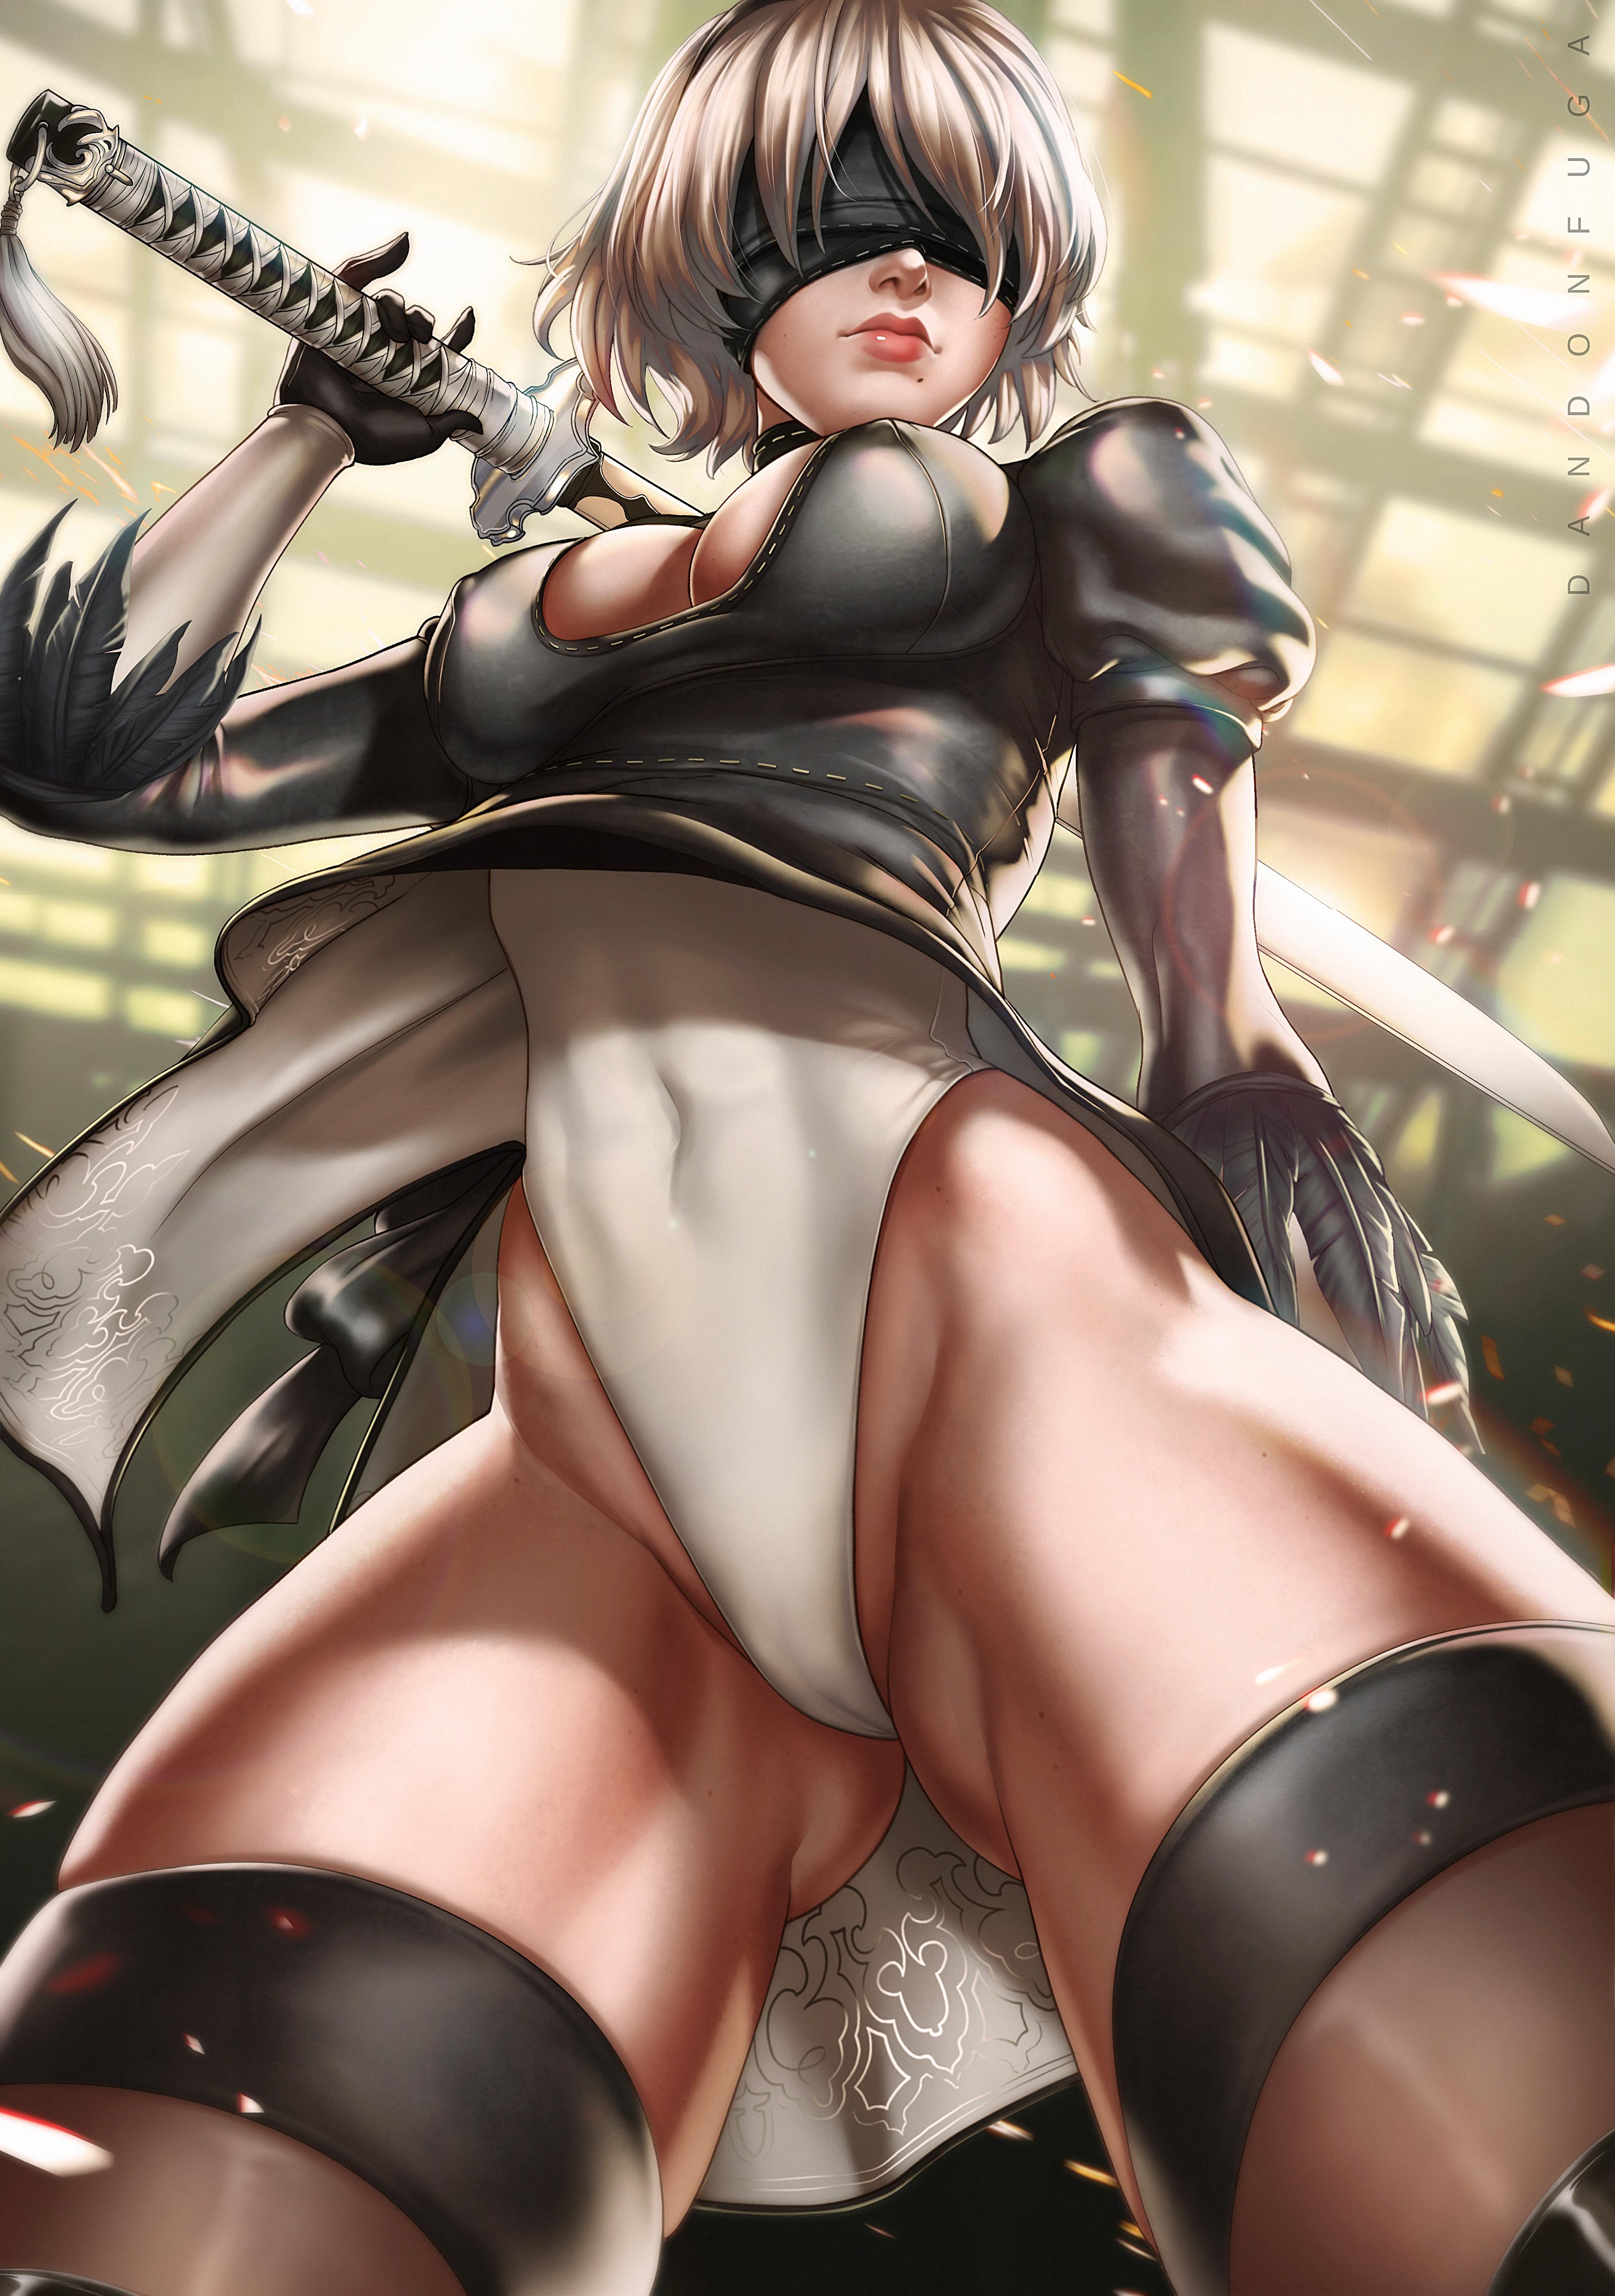 Anime 3441x4892 Dandonfuga cameltoe dress leotard NieR Nier: Automata thigh-highs 2B (Nier: Automata) sword cleavage nipple bulge blindfold